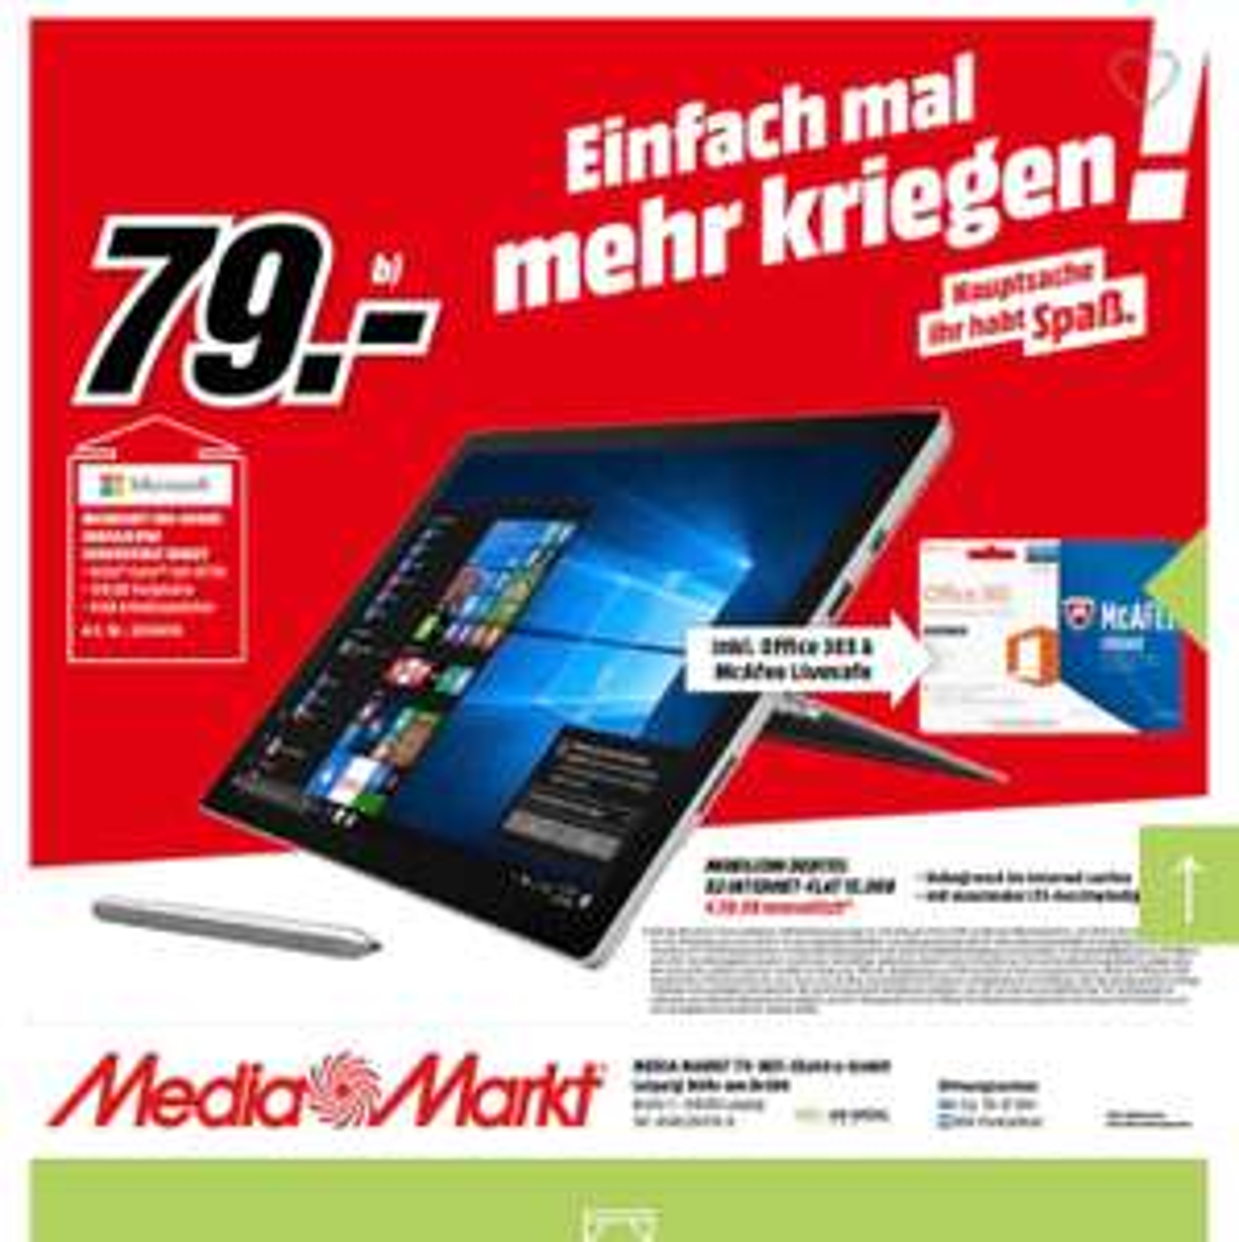 [Lokal] MM Leipzig Höfe am Brühl: Microsoft Surface Pro 4 128GB, m3 mit 15 GB Datenvolumen LTE max